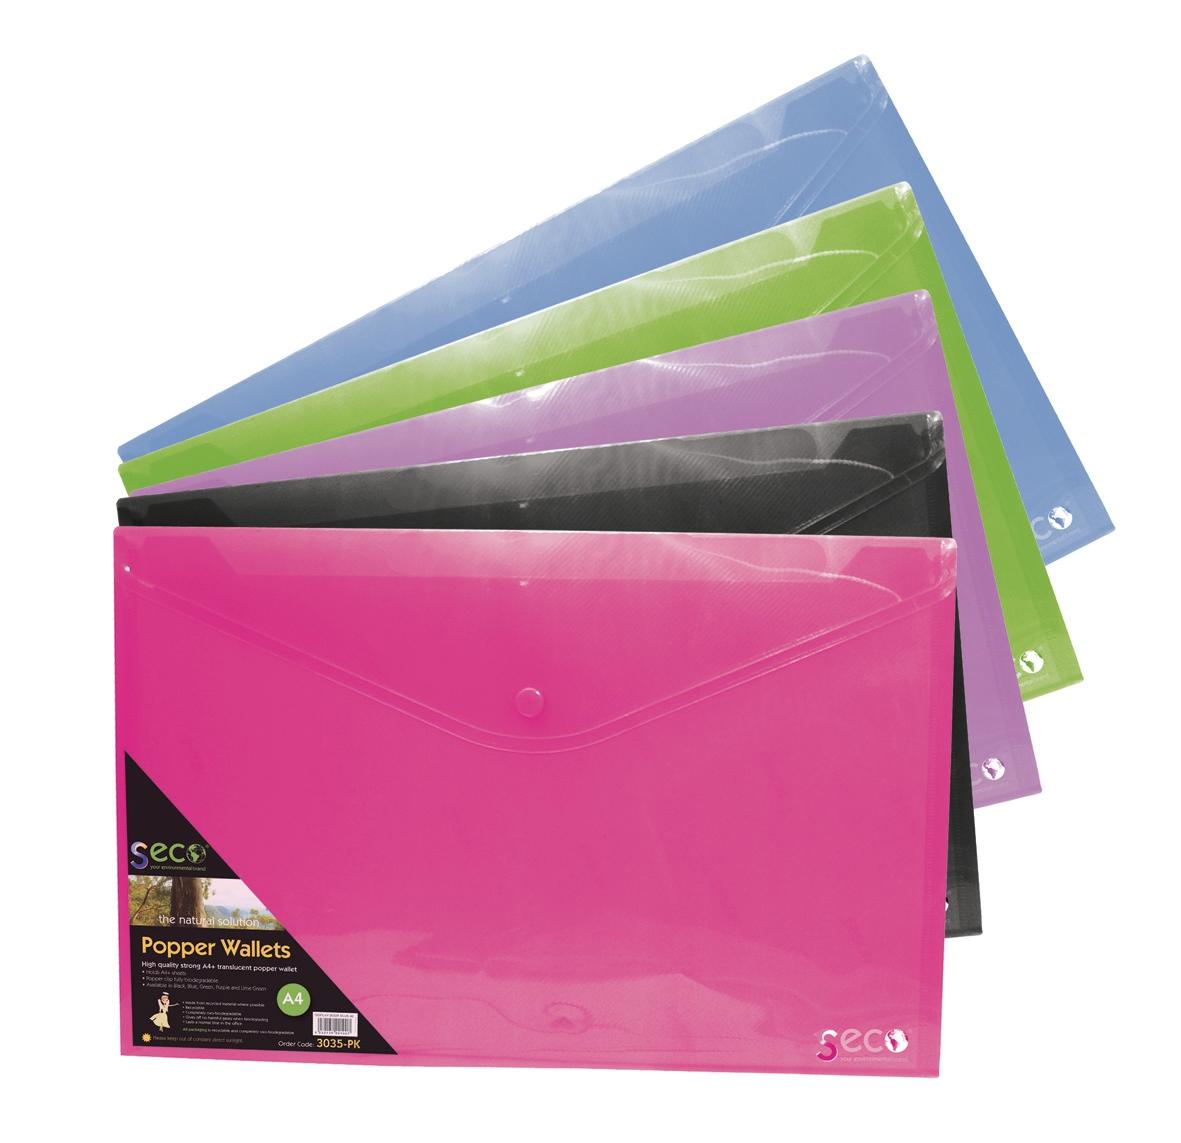 Stewart Superior A4 Popper Wallet Landscape Assorted Pack 5 PPLSA4-AST